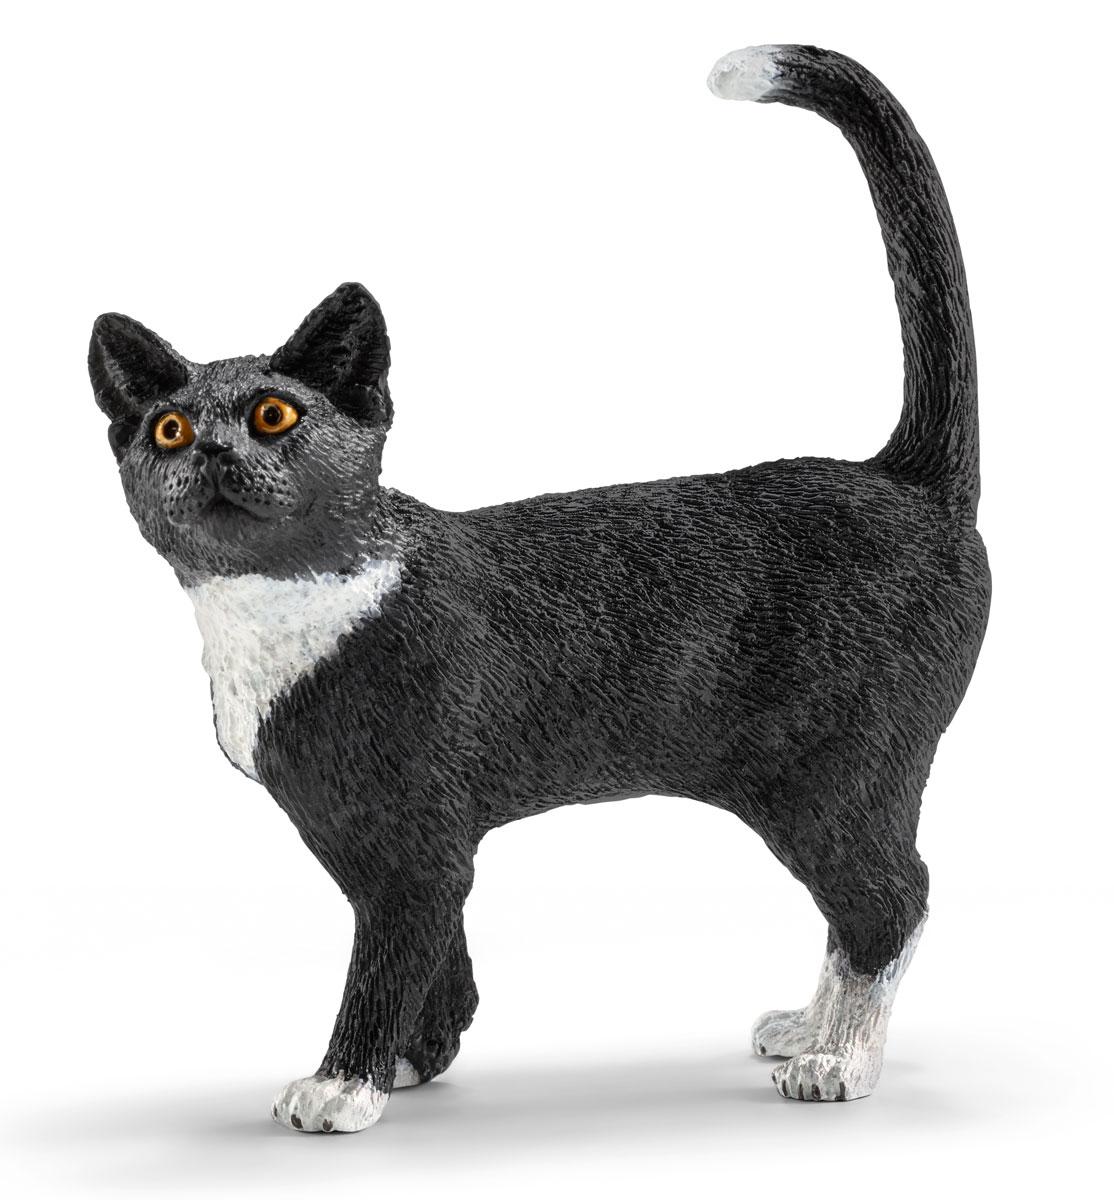 Schleich Фигурка Кошка цвет черный белый schleich фигурка карликовый козел